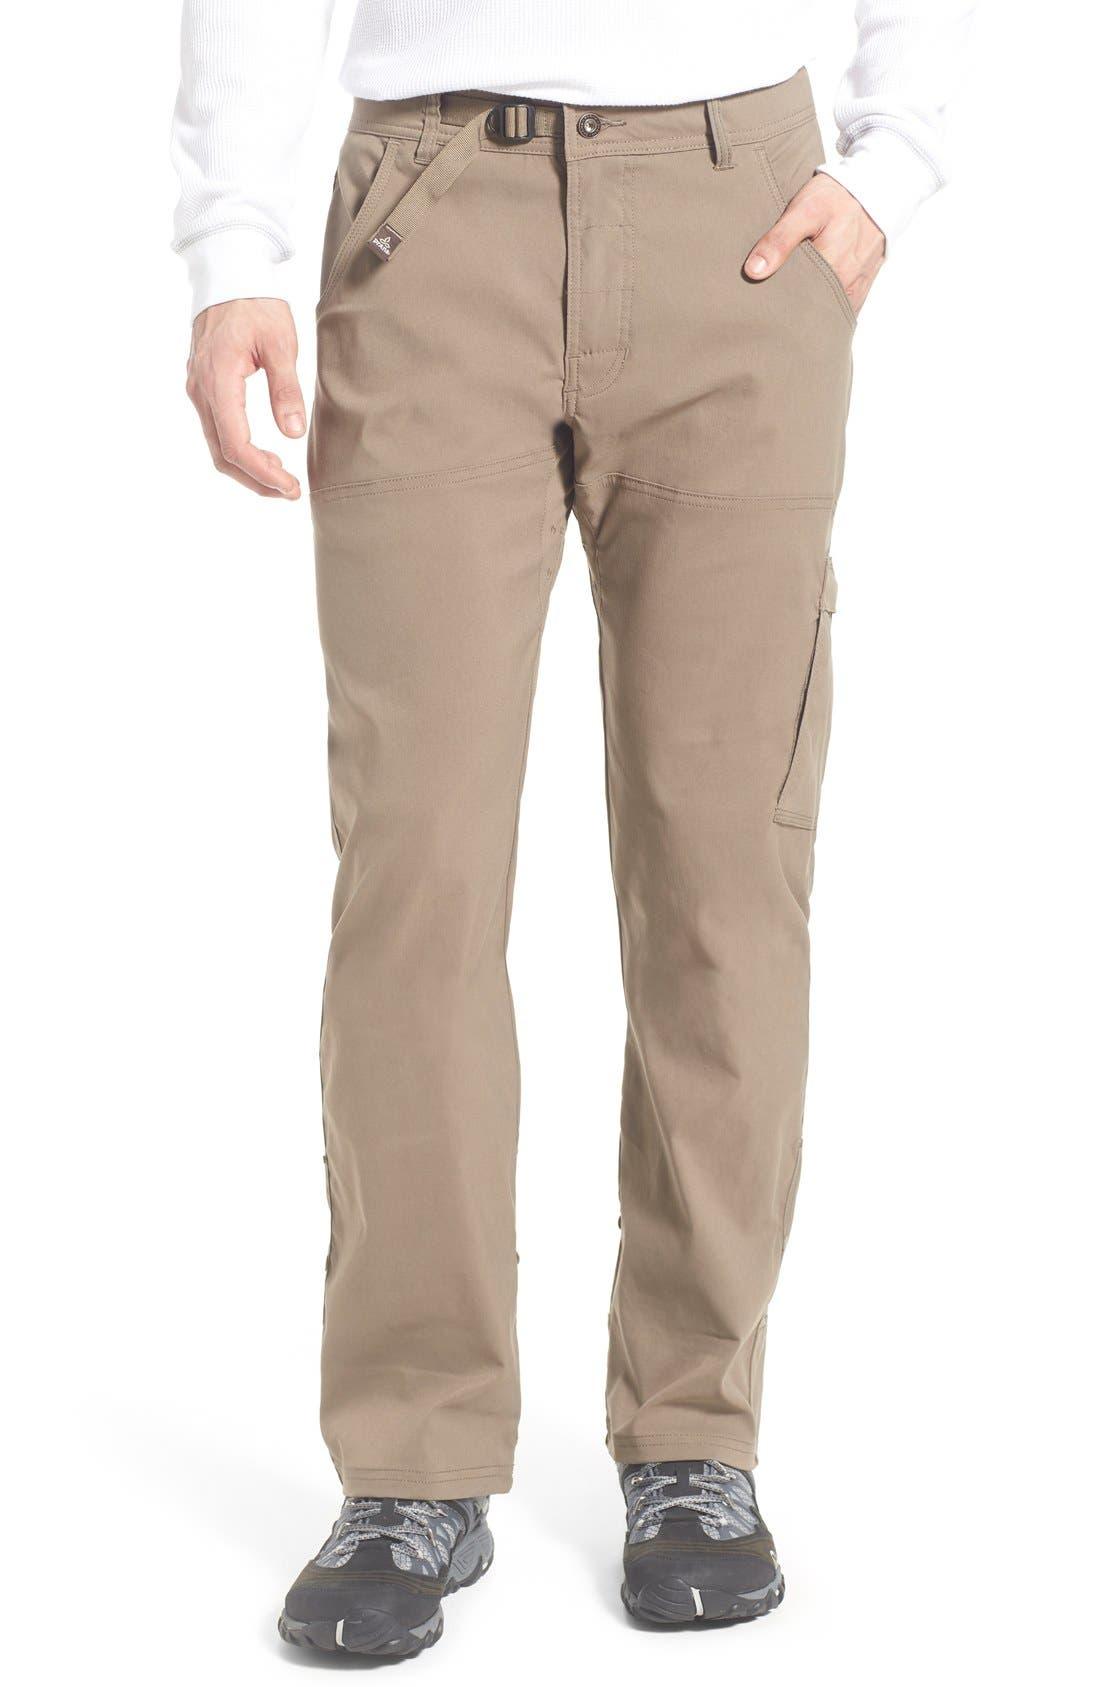 Zion Stretch Pants,                             Main thumbnail 1, color,                             Mud